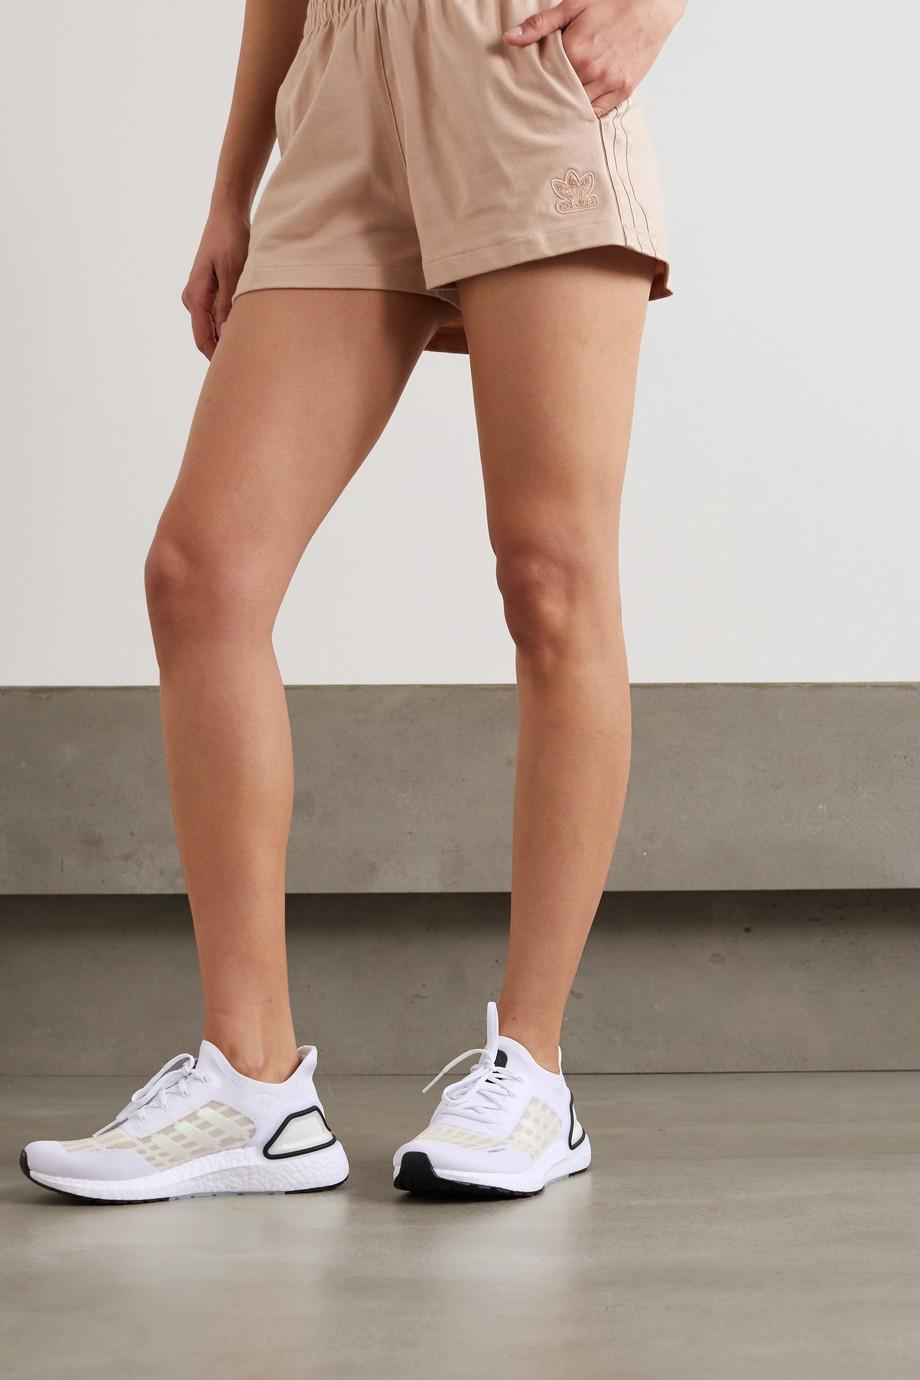 adidas Originals UltraBoost SUMMER.RDY Primeknit Sneakers